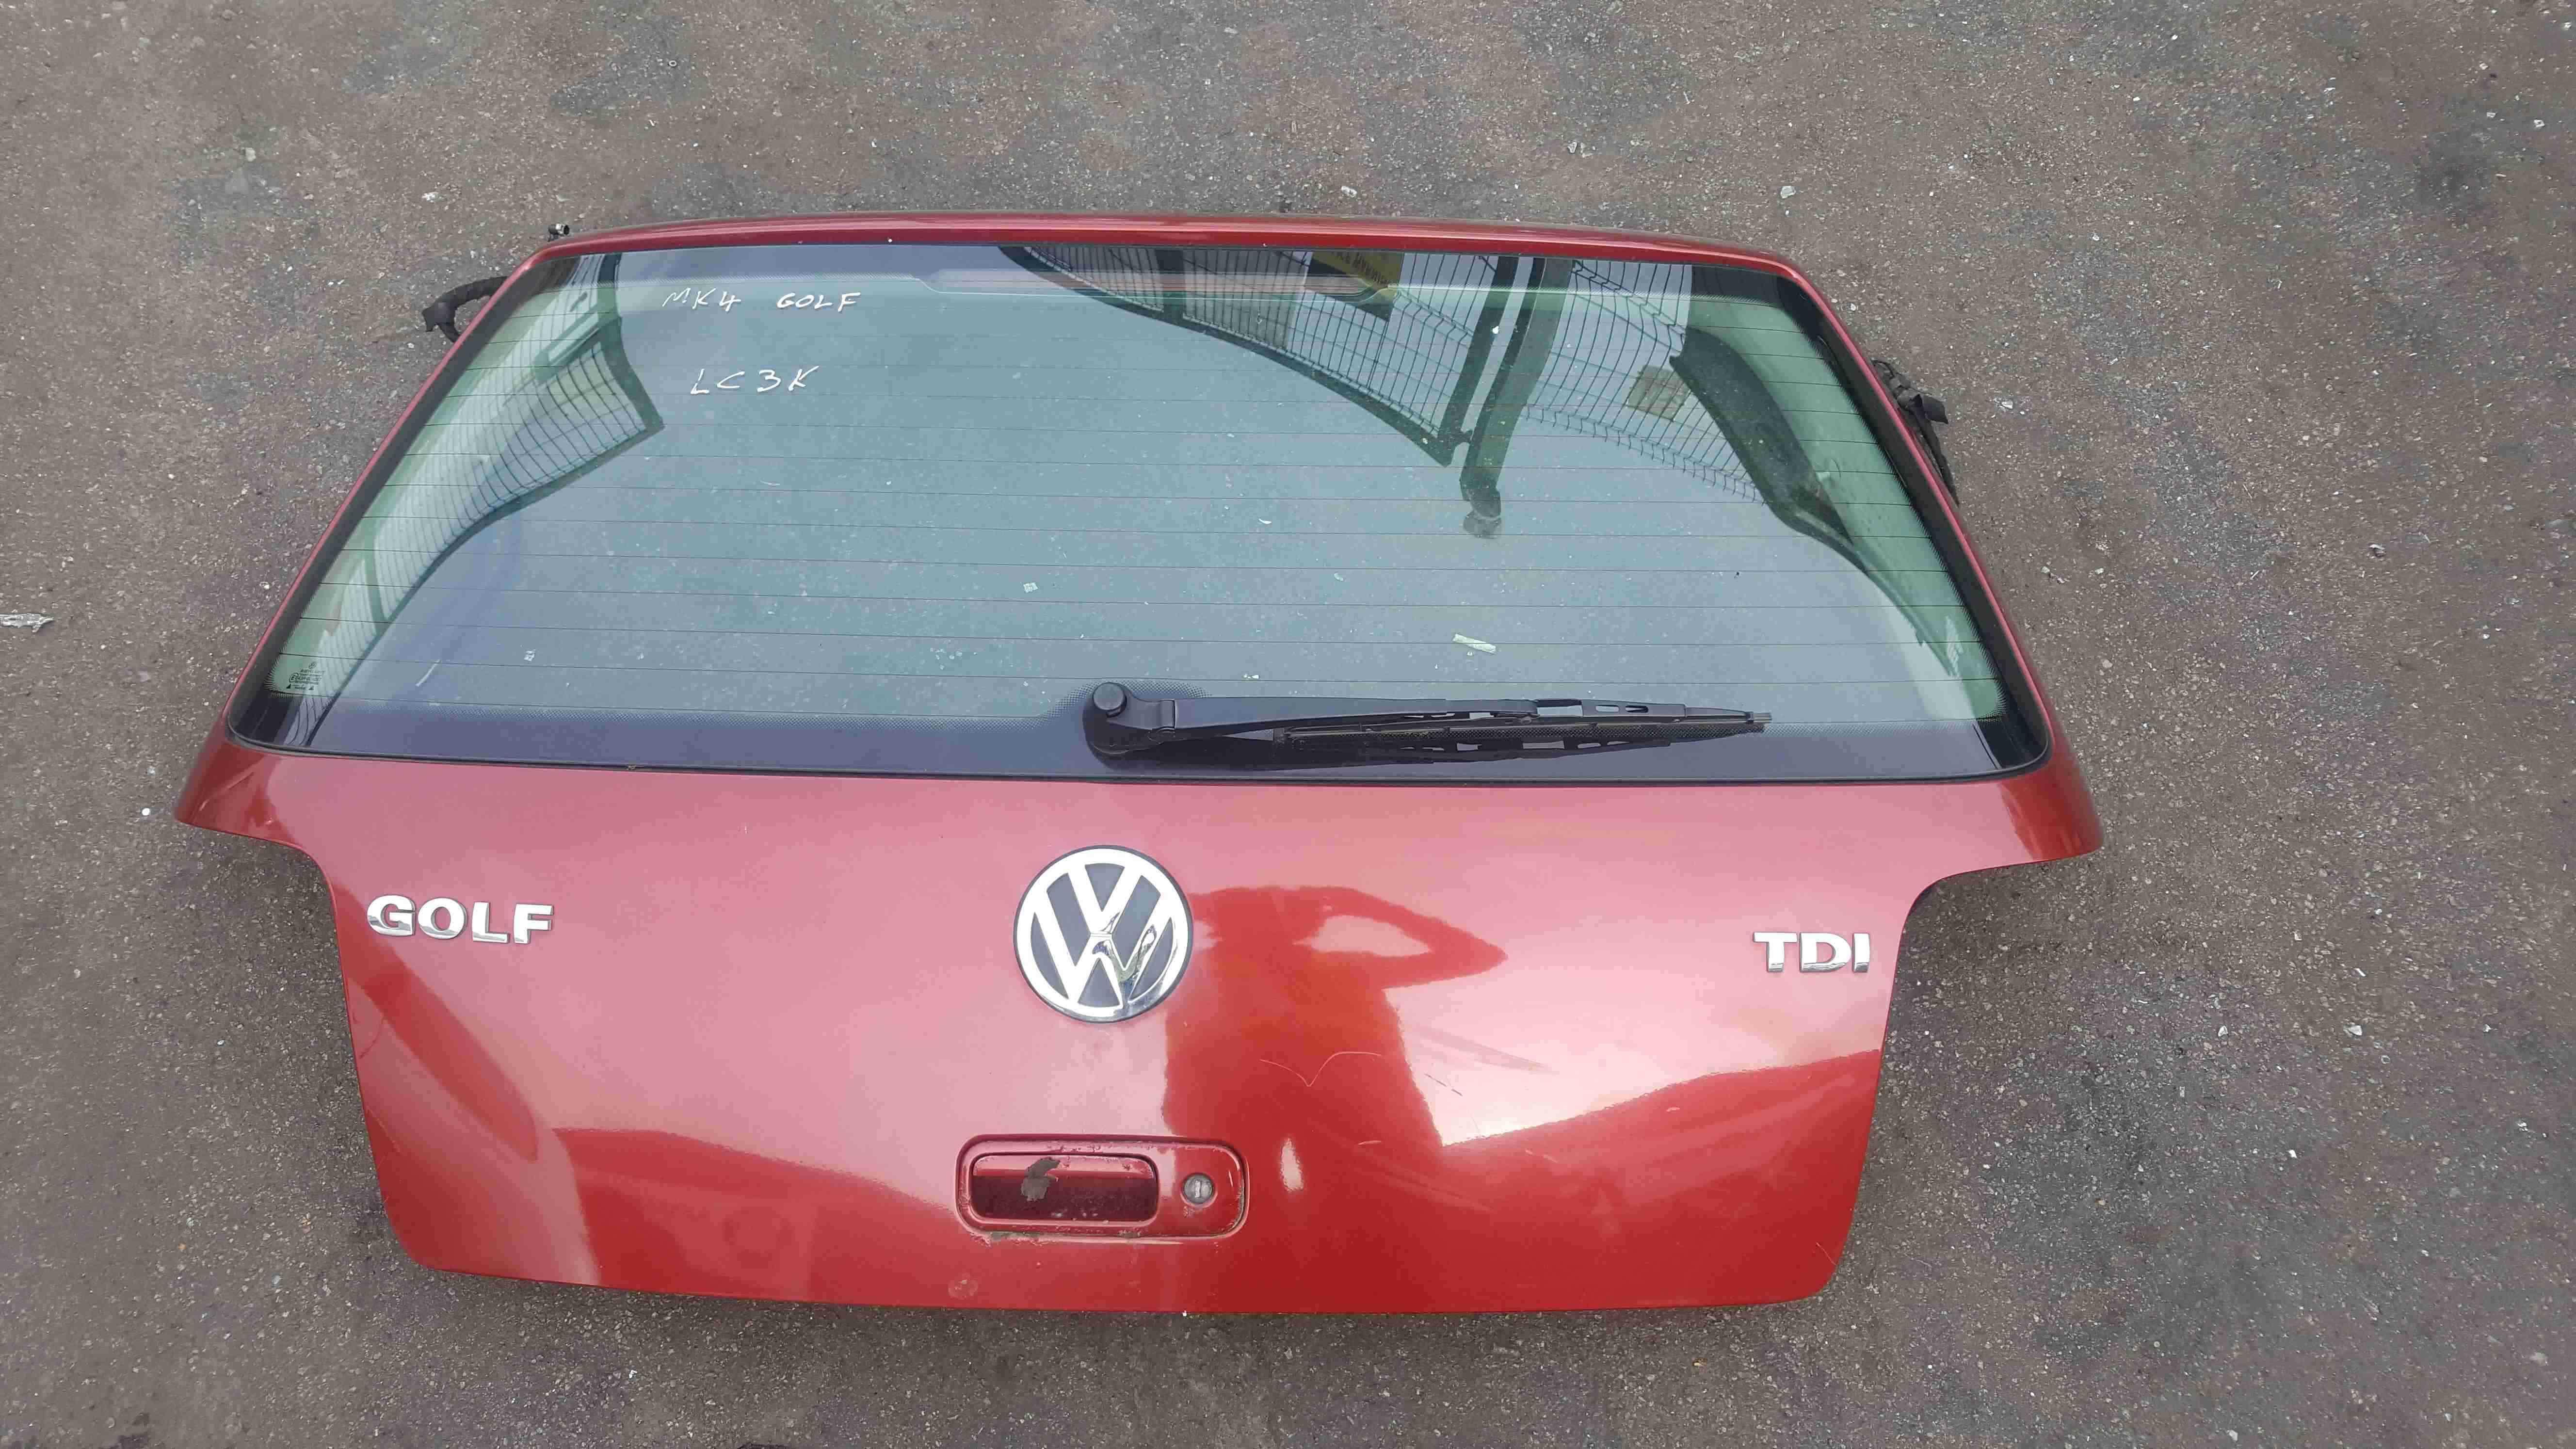 Volkswagen Golf MK4 1997-2004 Rear Tailgate Boot Red LC3K